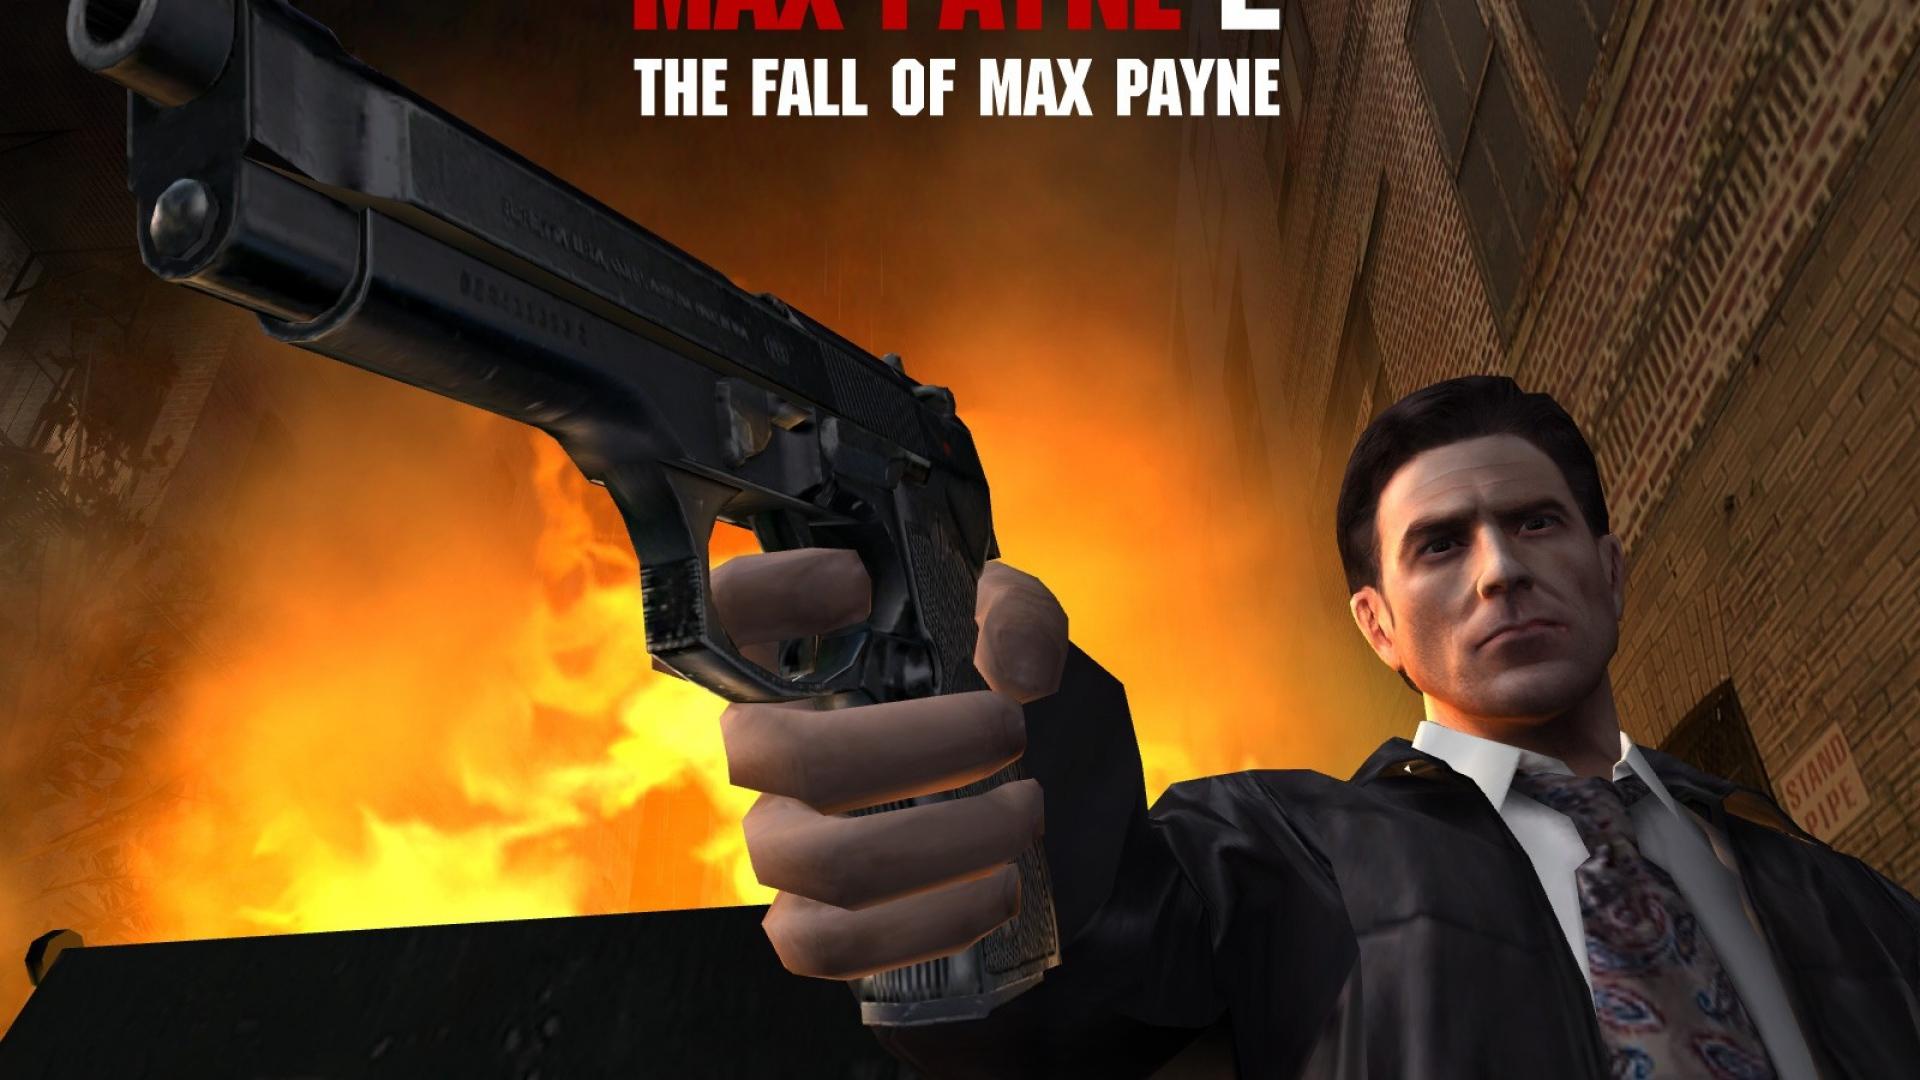 Beautiful Wallpaper Movie Max Payne - max_payne_2_the_fall_of_max_payne_pistol_fire_wildfire_house_16134_1920x1080  HD_152780.jpg